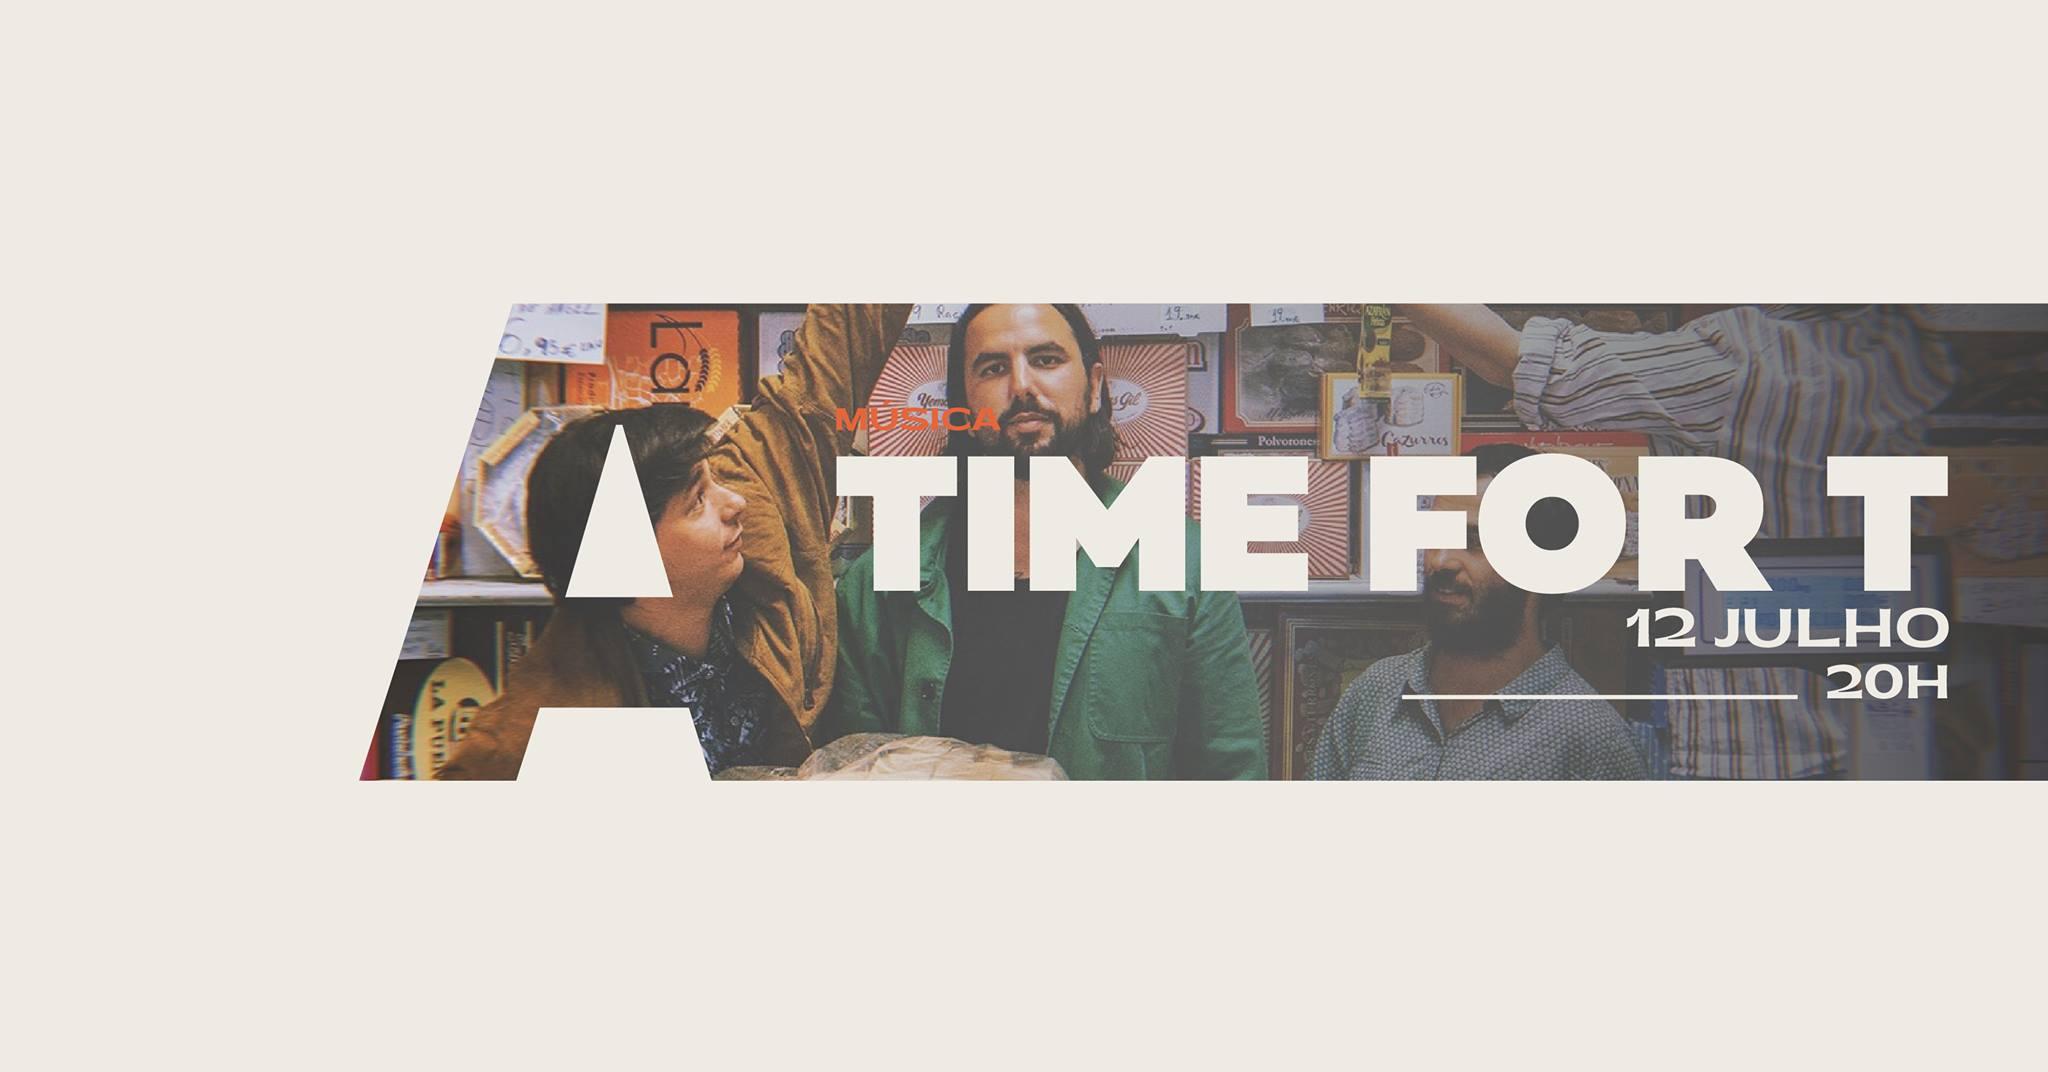 TIME FOR T - AVEIRO CONCERTO